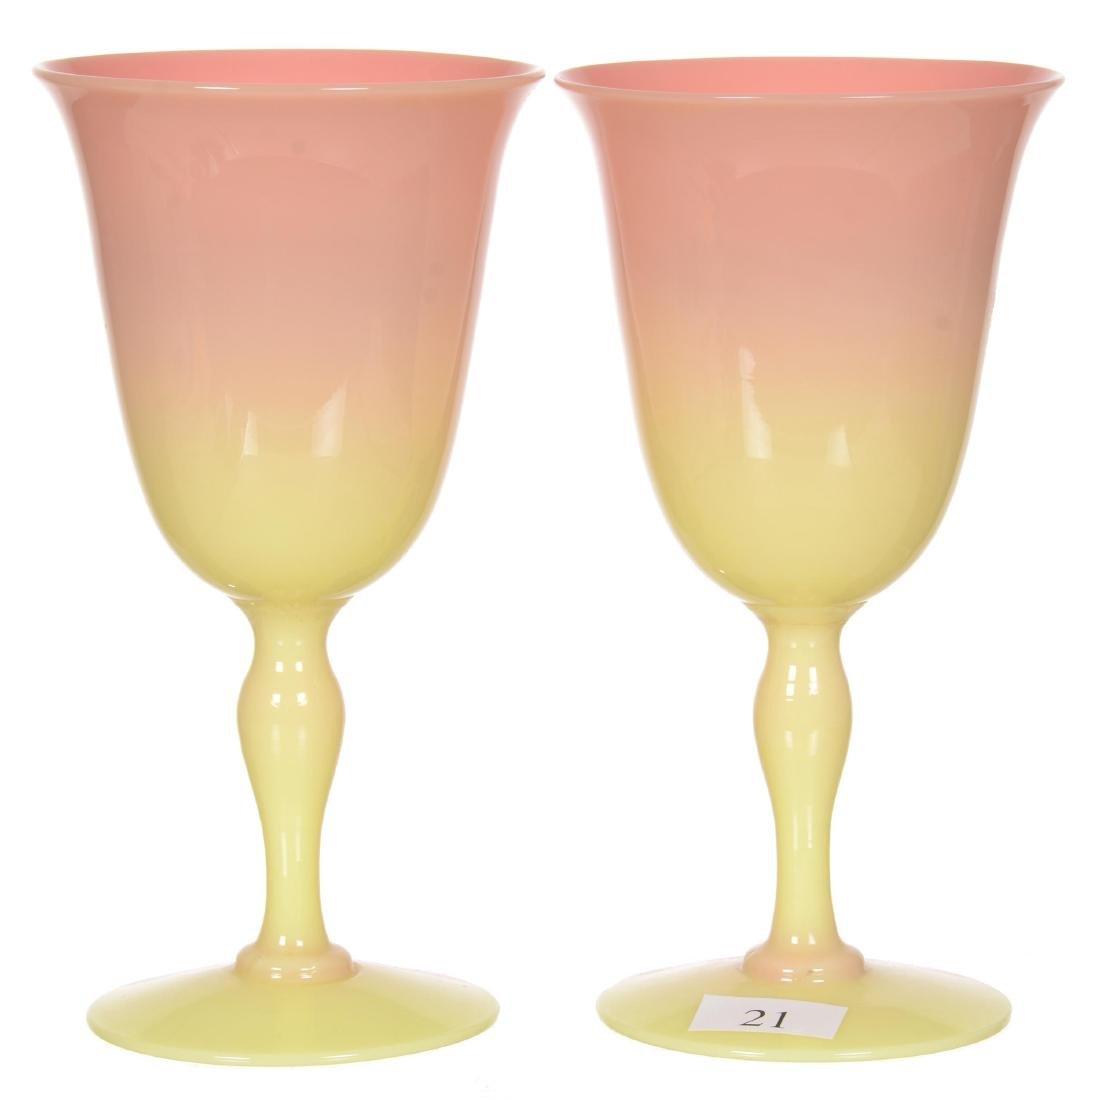 "Pair 6.5"" Mt. Washington Glossy Burmese Wedding Goblets"